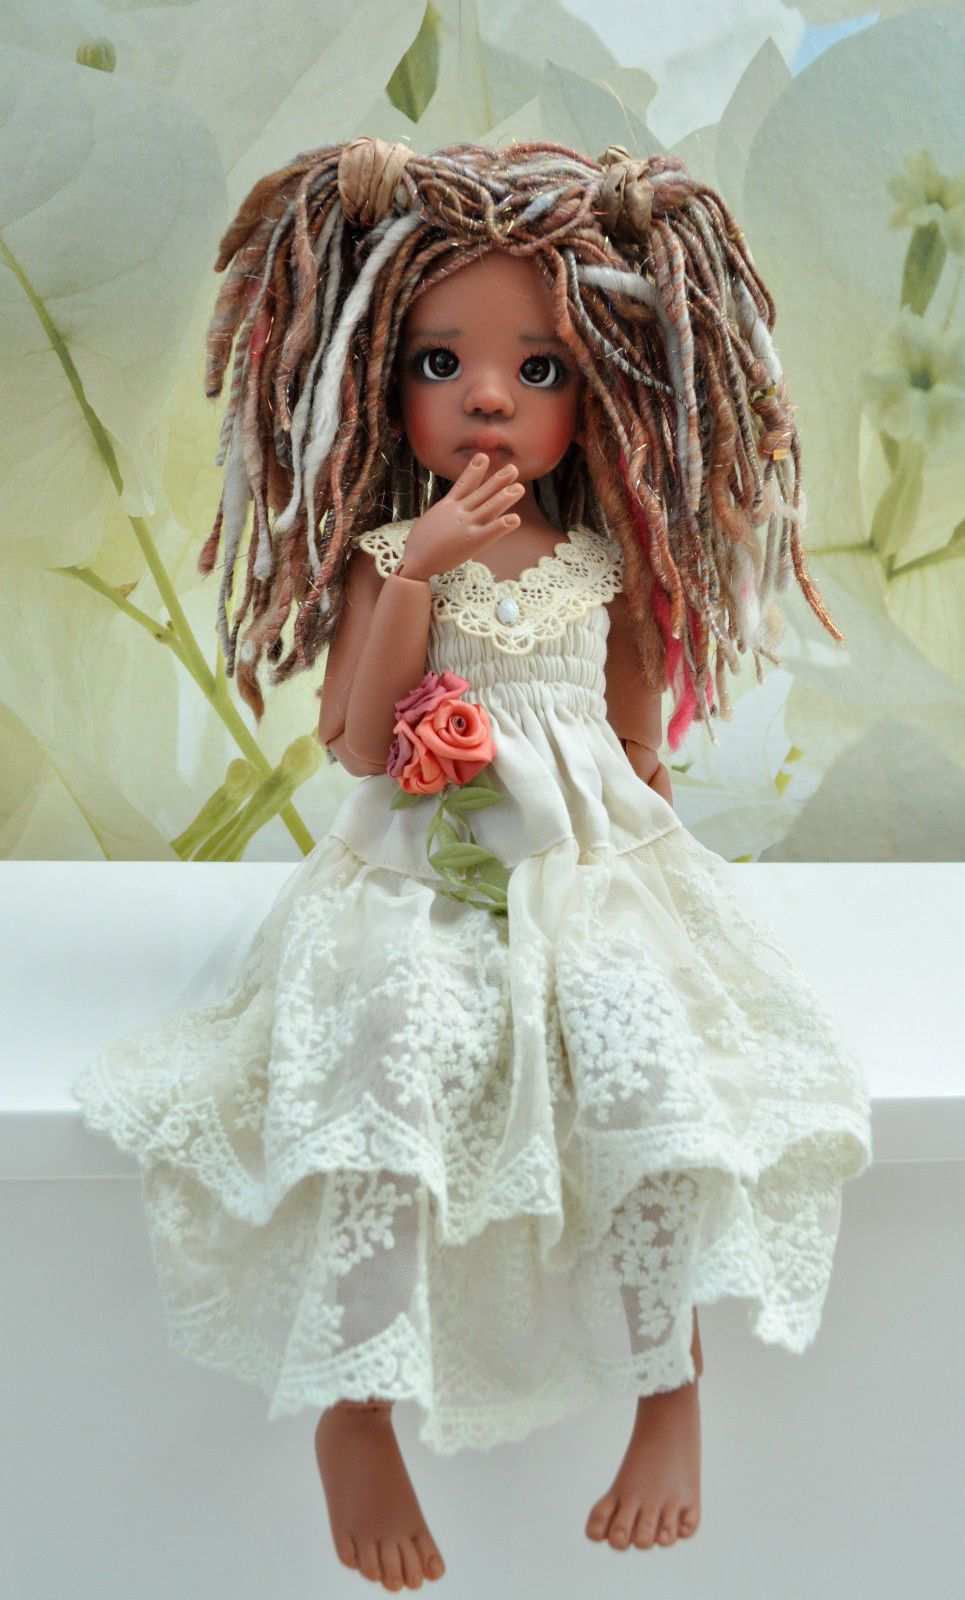 New Talyssa Human in Coffee Tan Skin Tone Kaye Wiggs MSD BJD Doll 1 Day Sale | eBay